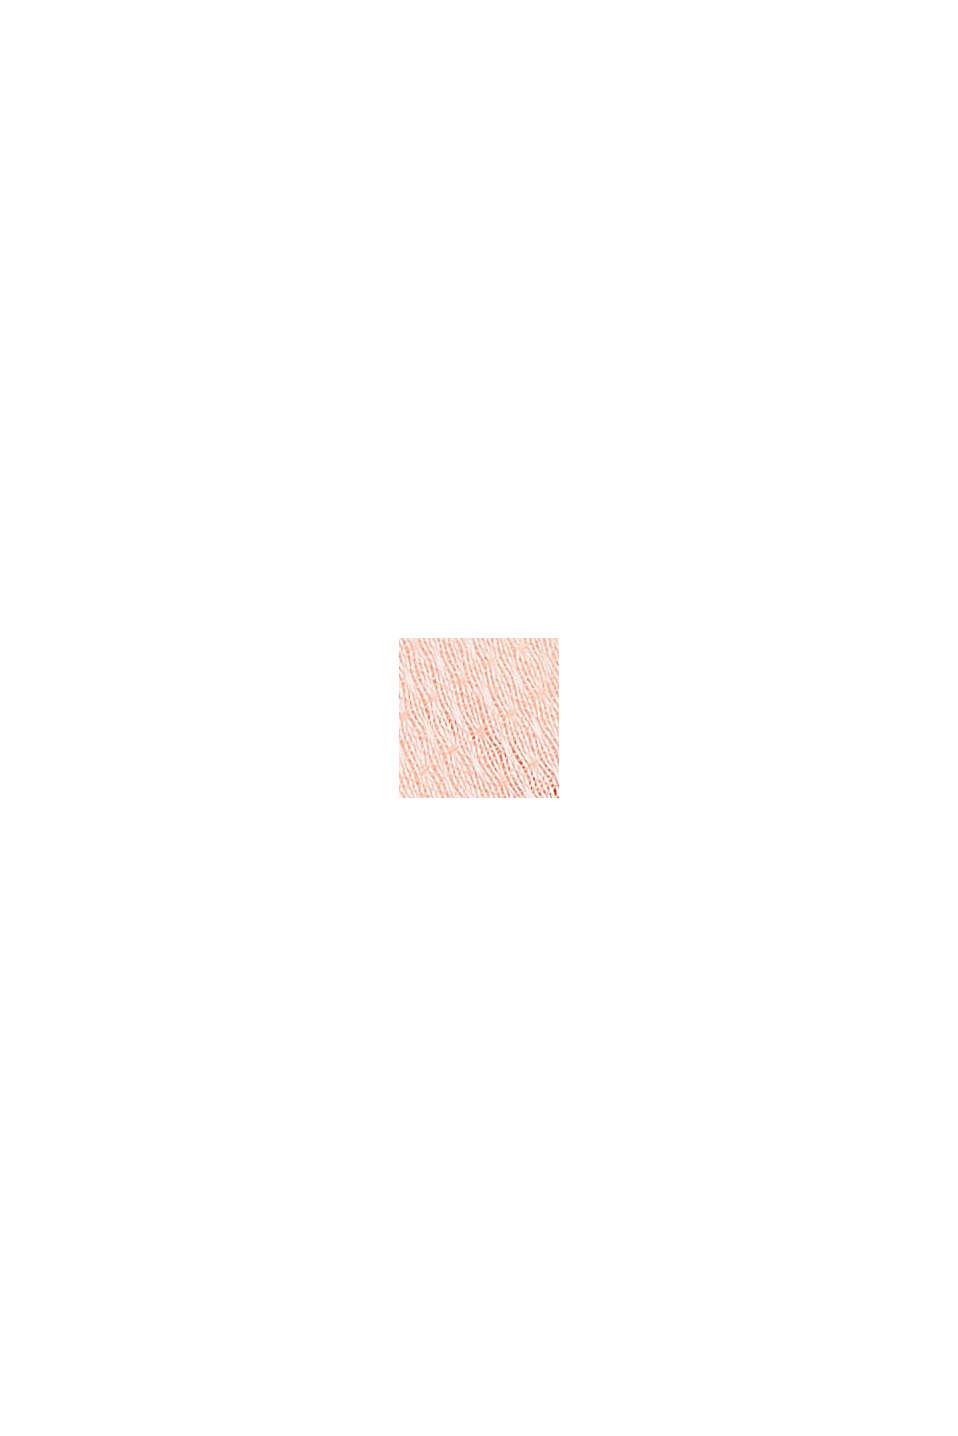 Foulard texturé à teneur en TENCEL™ REFIBRA™, SALMON, swatch